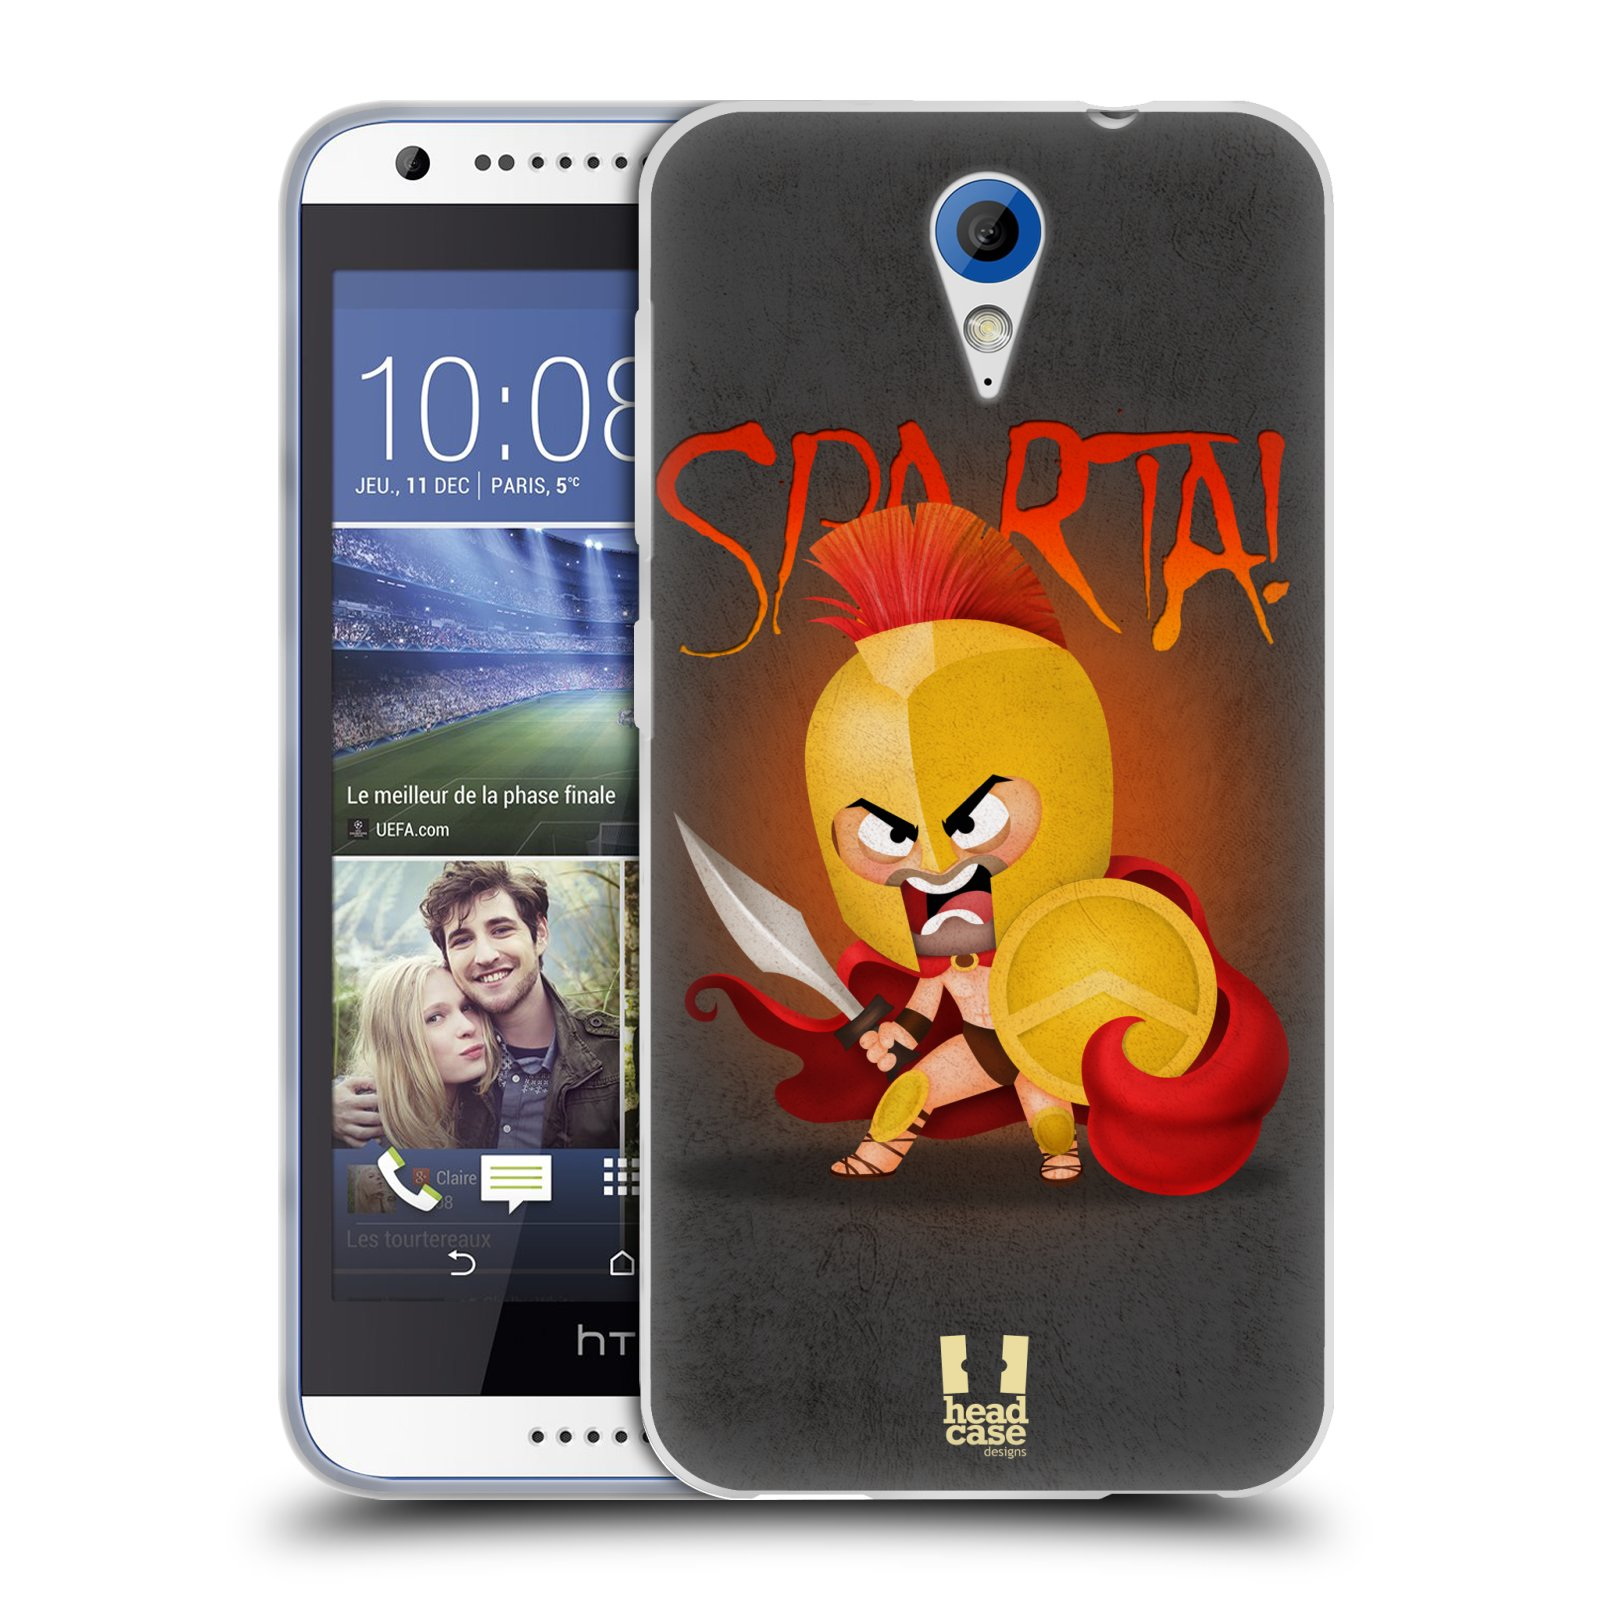 Silikonové pouzdro na mobil HTC Desire 620 HEAD CASE Sparta (Silikonový kryt či obal na mobilní telefon HTC Desire 620)